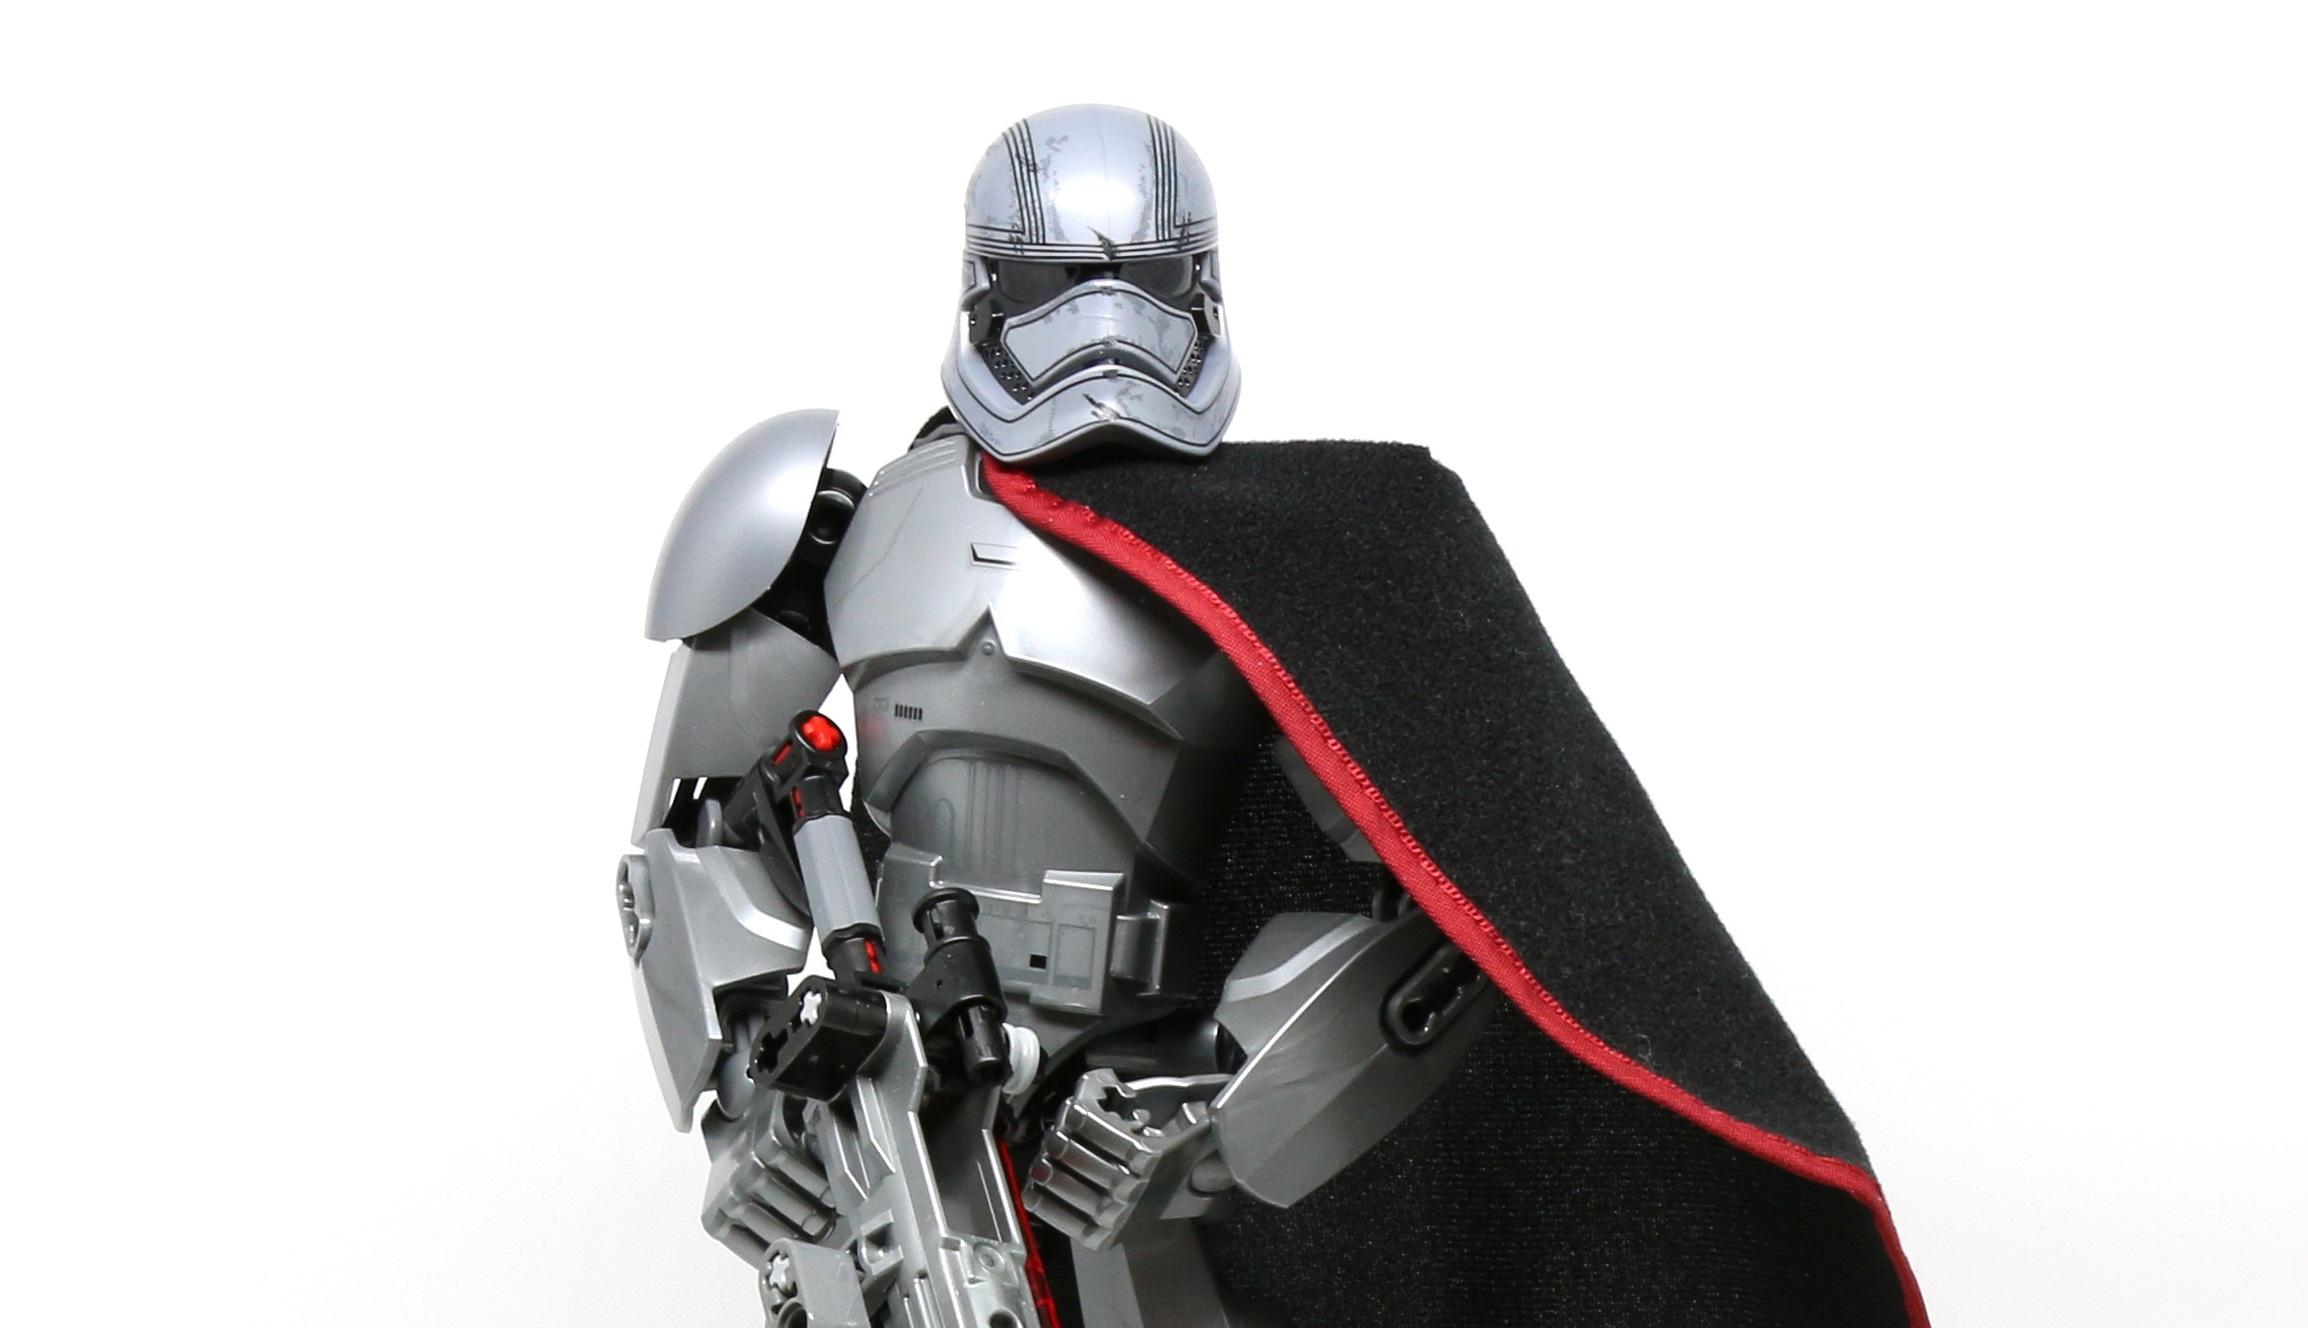 lego starwars the force awakens how to get captain phasma